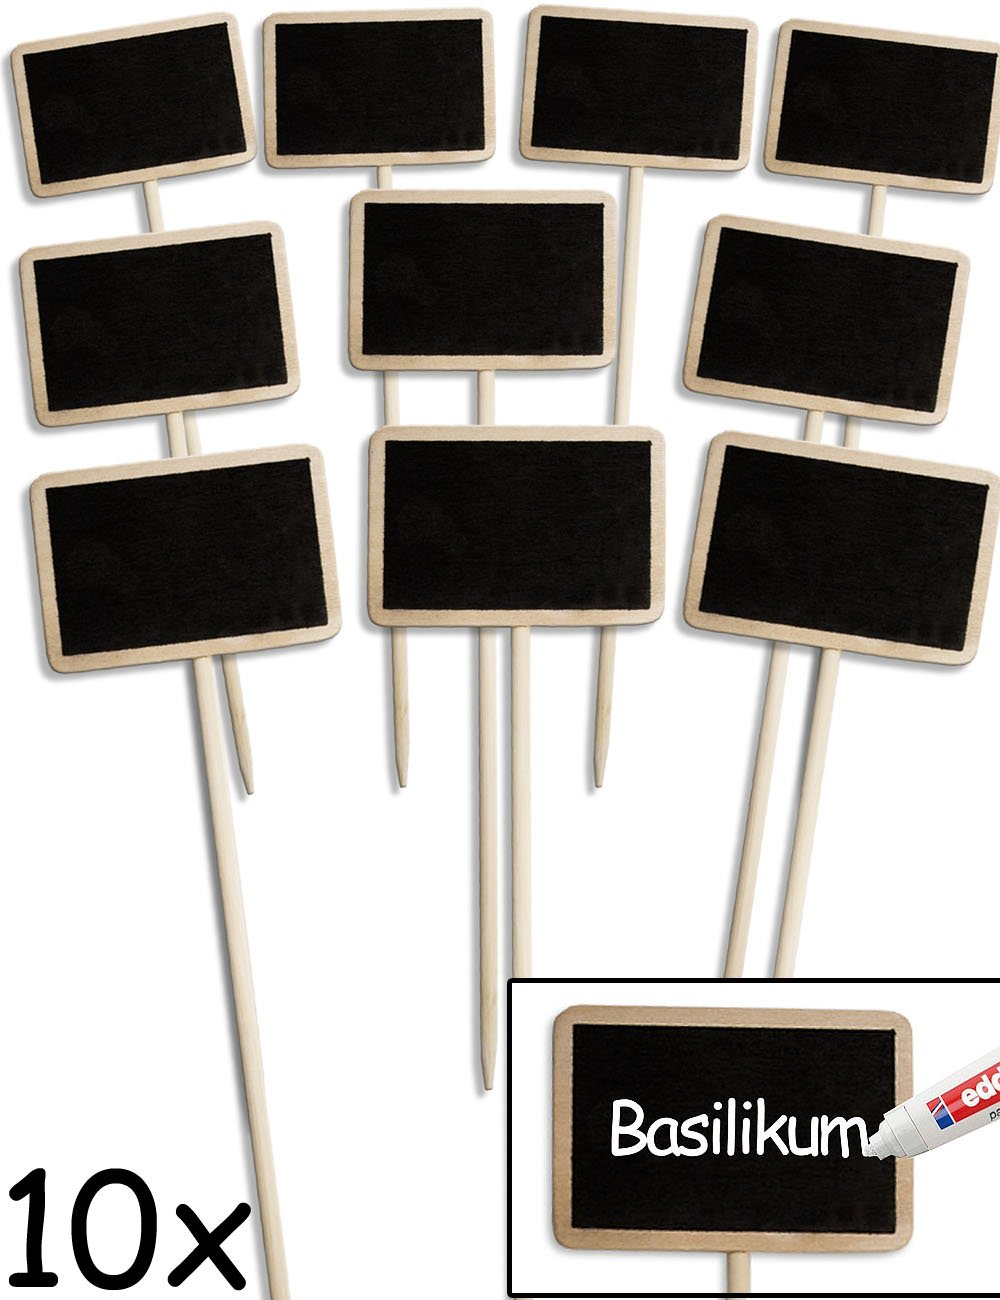 HomeTools.eu - 10x Klassische Holz Pflanz-Schilder | Beet Balkon ...